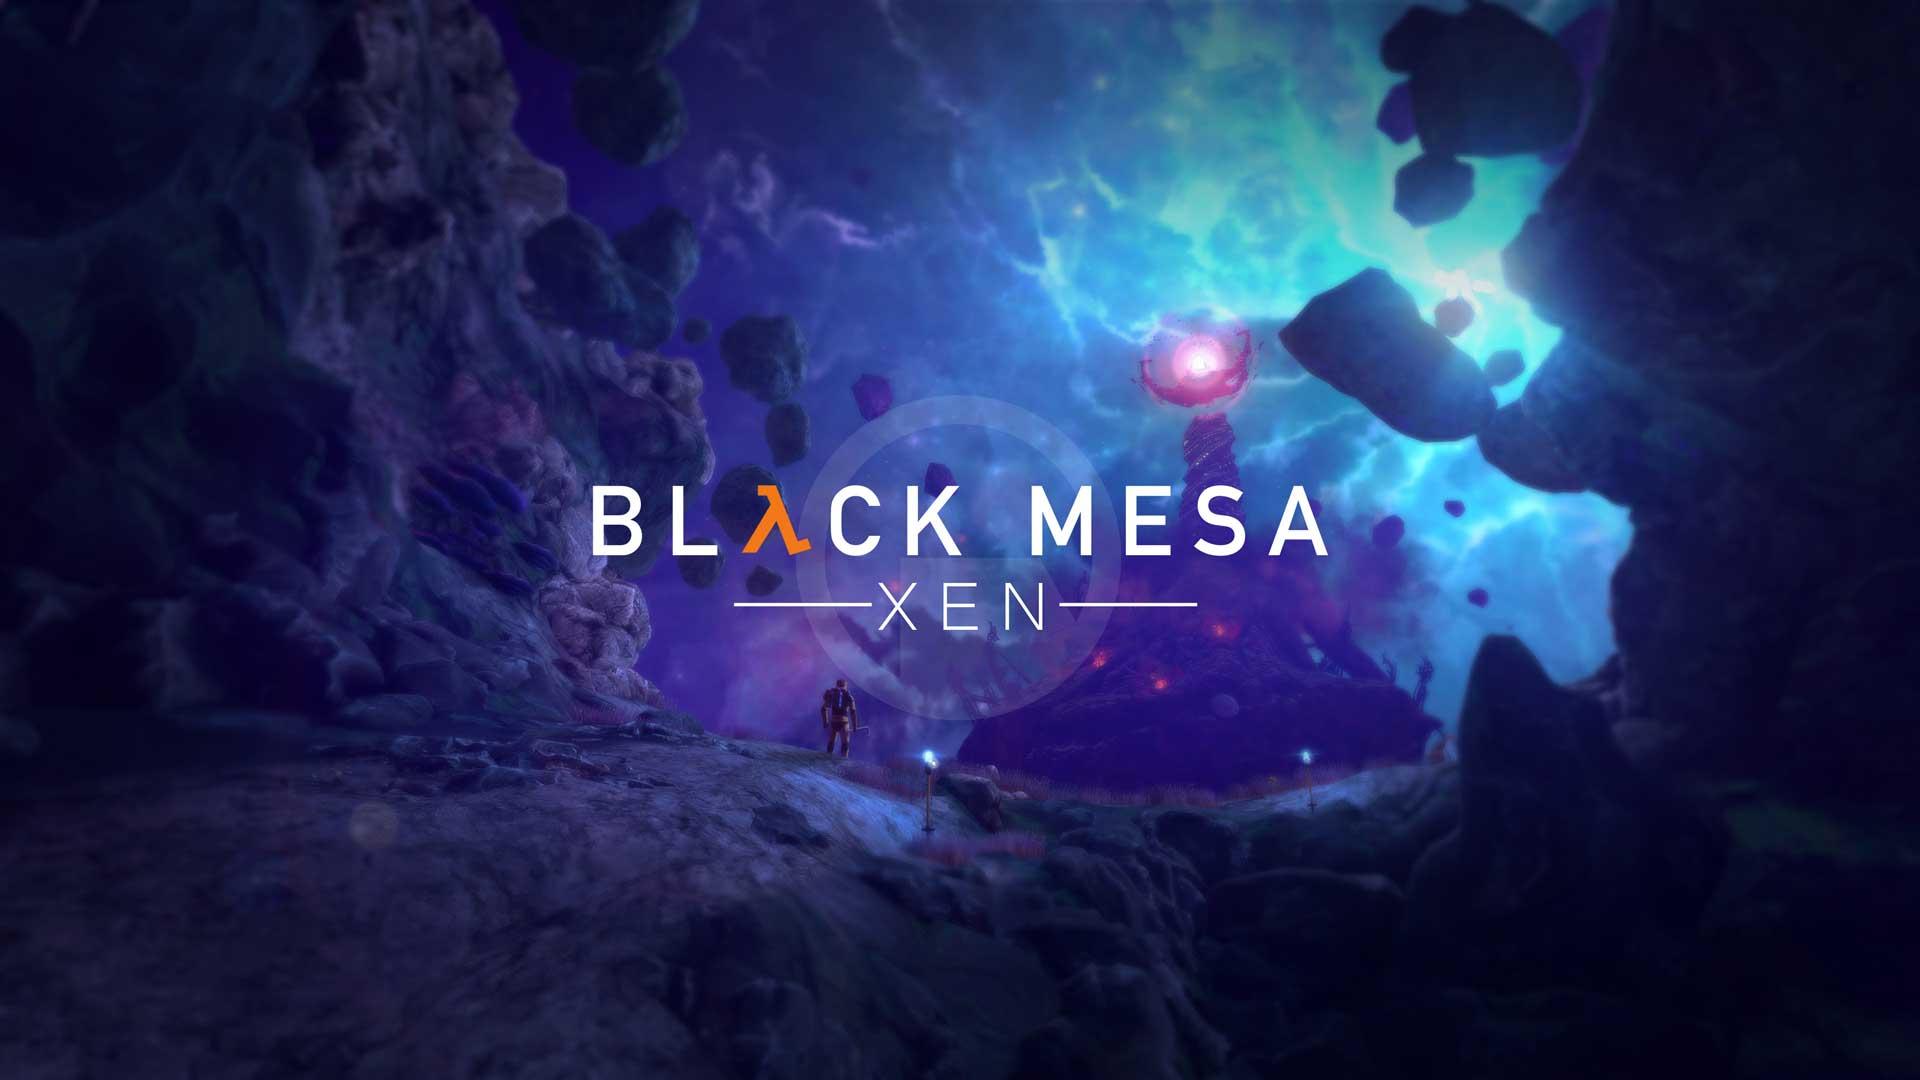 Half-Life Remake Black Mesa Crowbar Collective